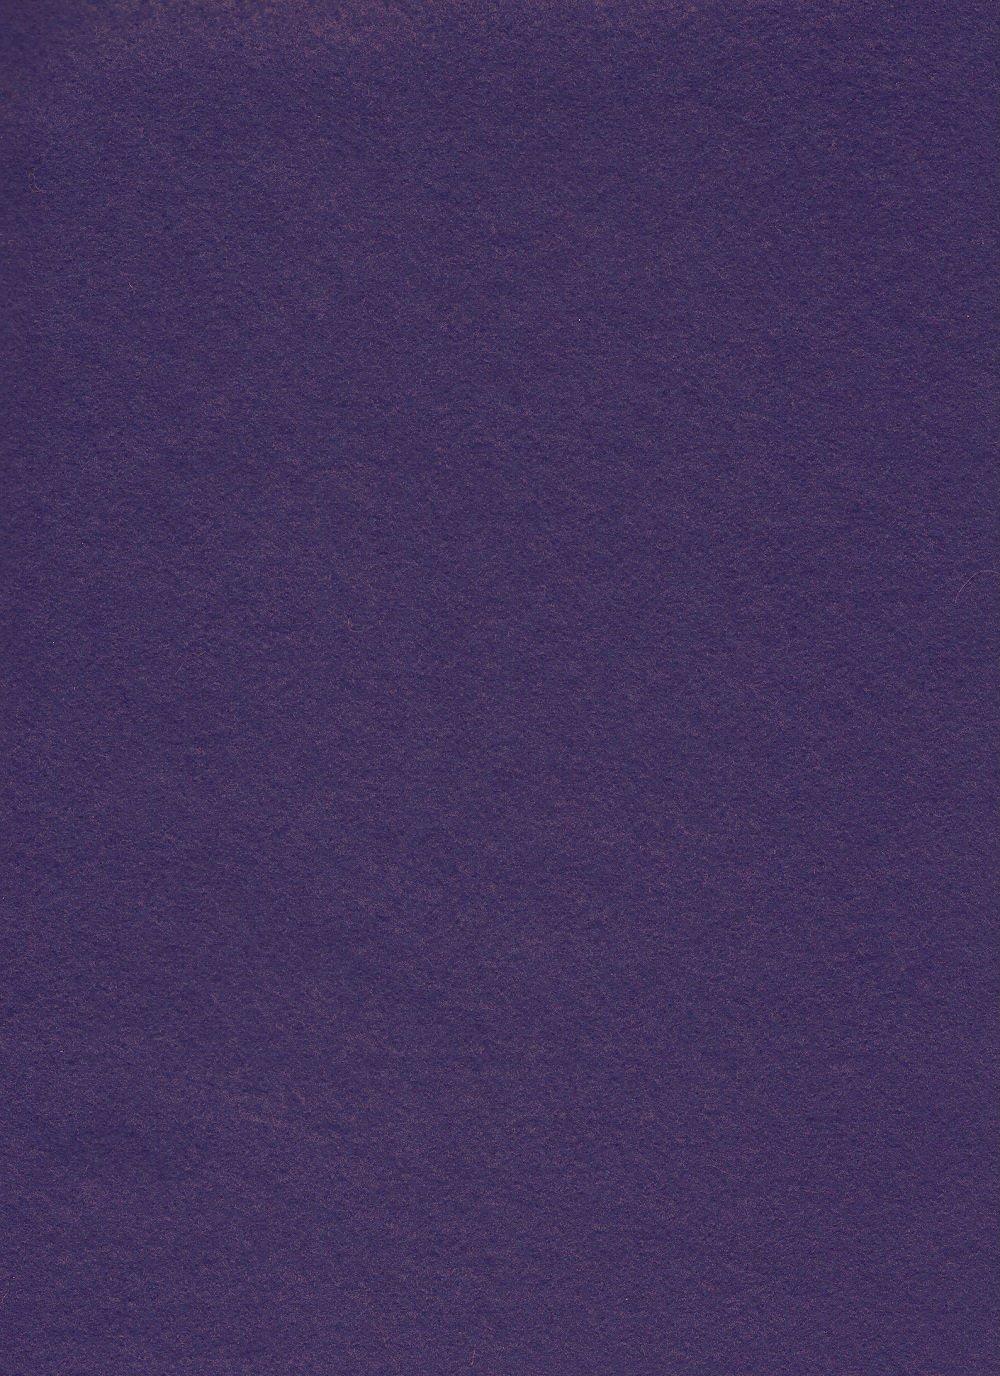 Purple - 12 x 18 Square